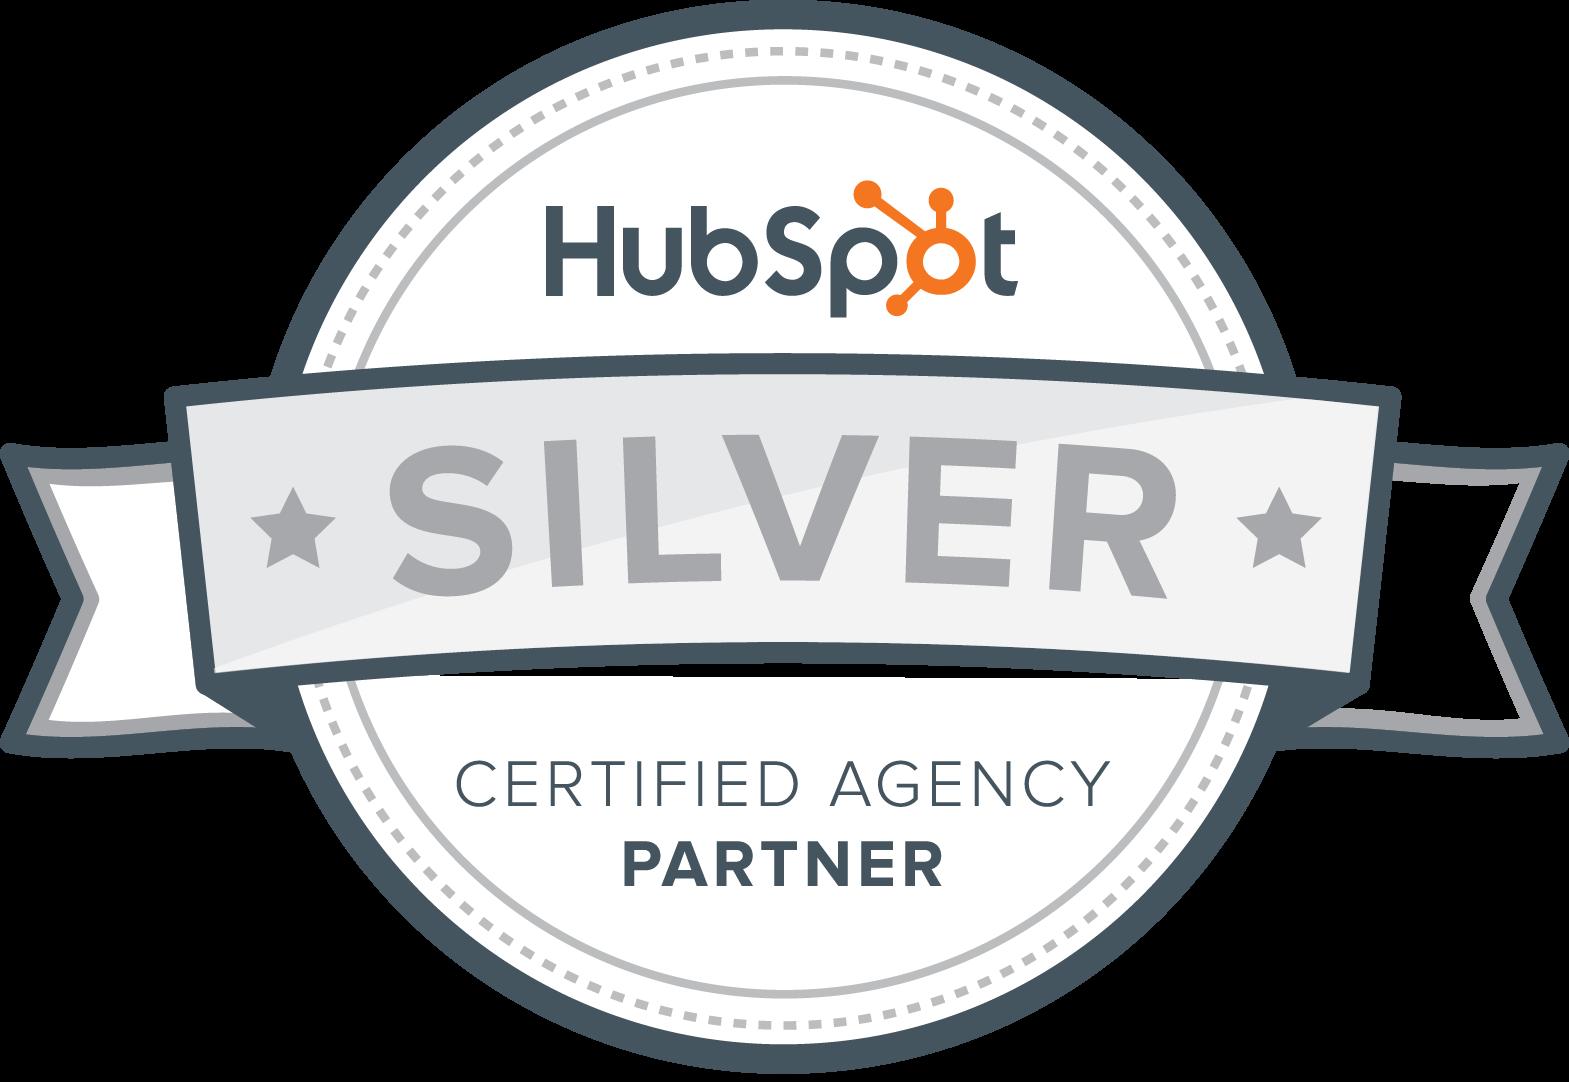 hubspot-certified-partners